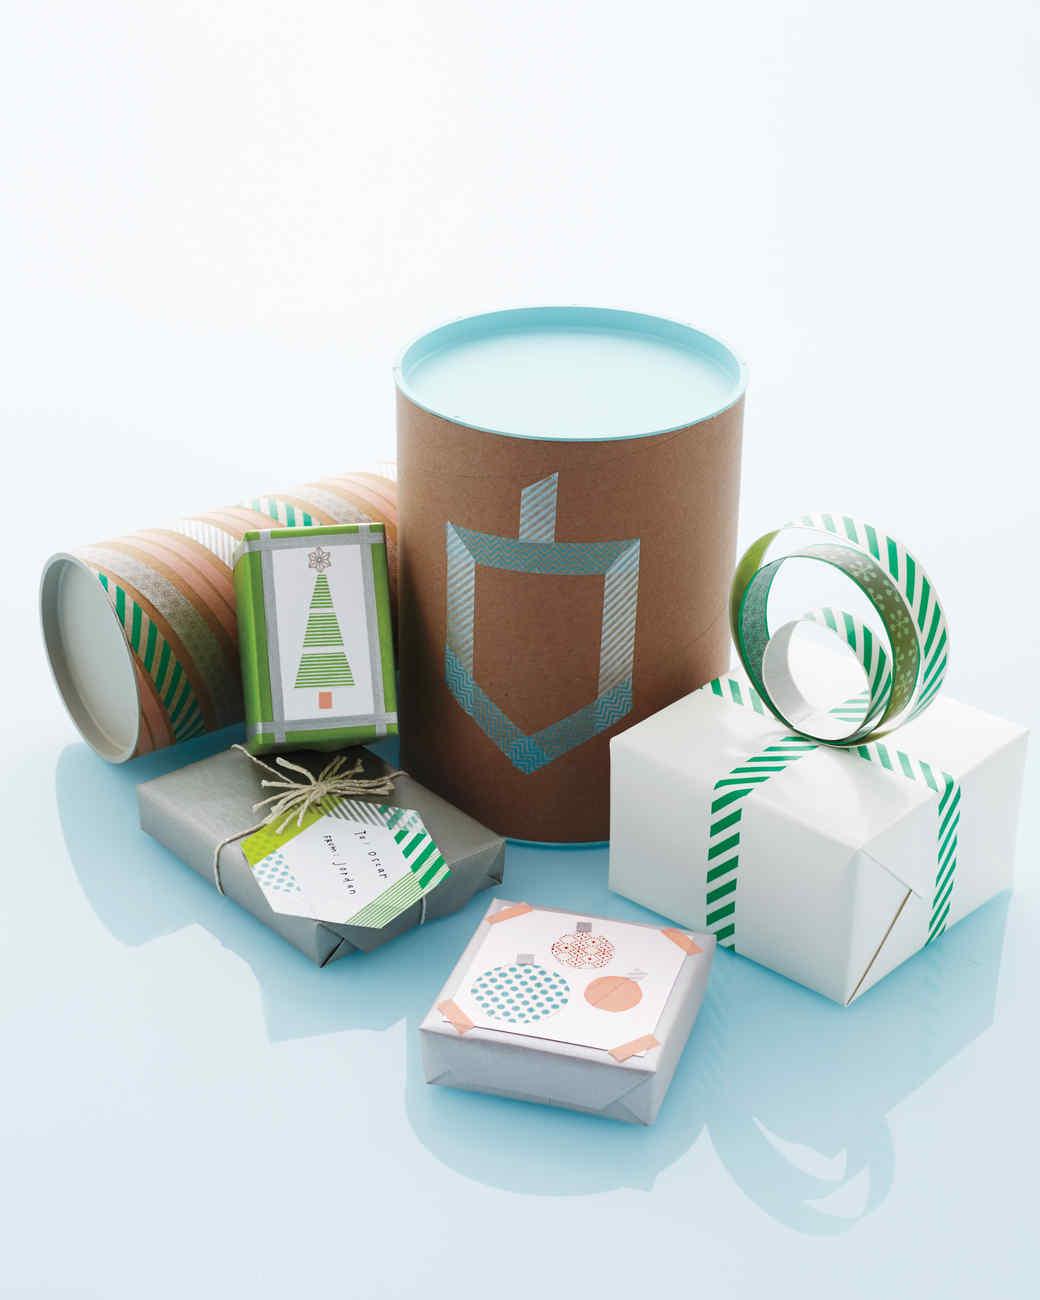 gift-tags-2-0074-v3main-d111506.jpg